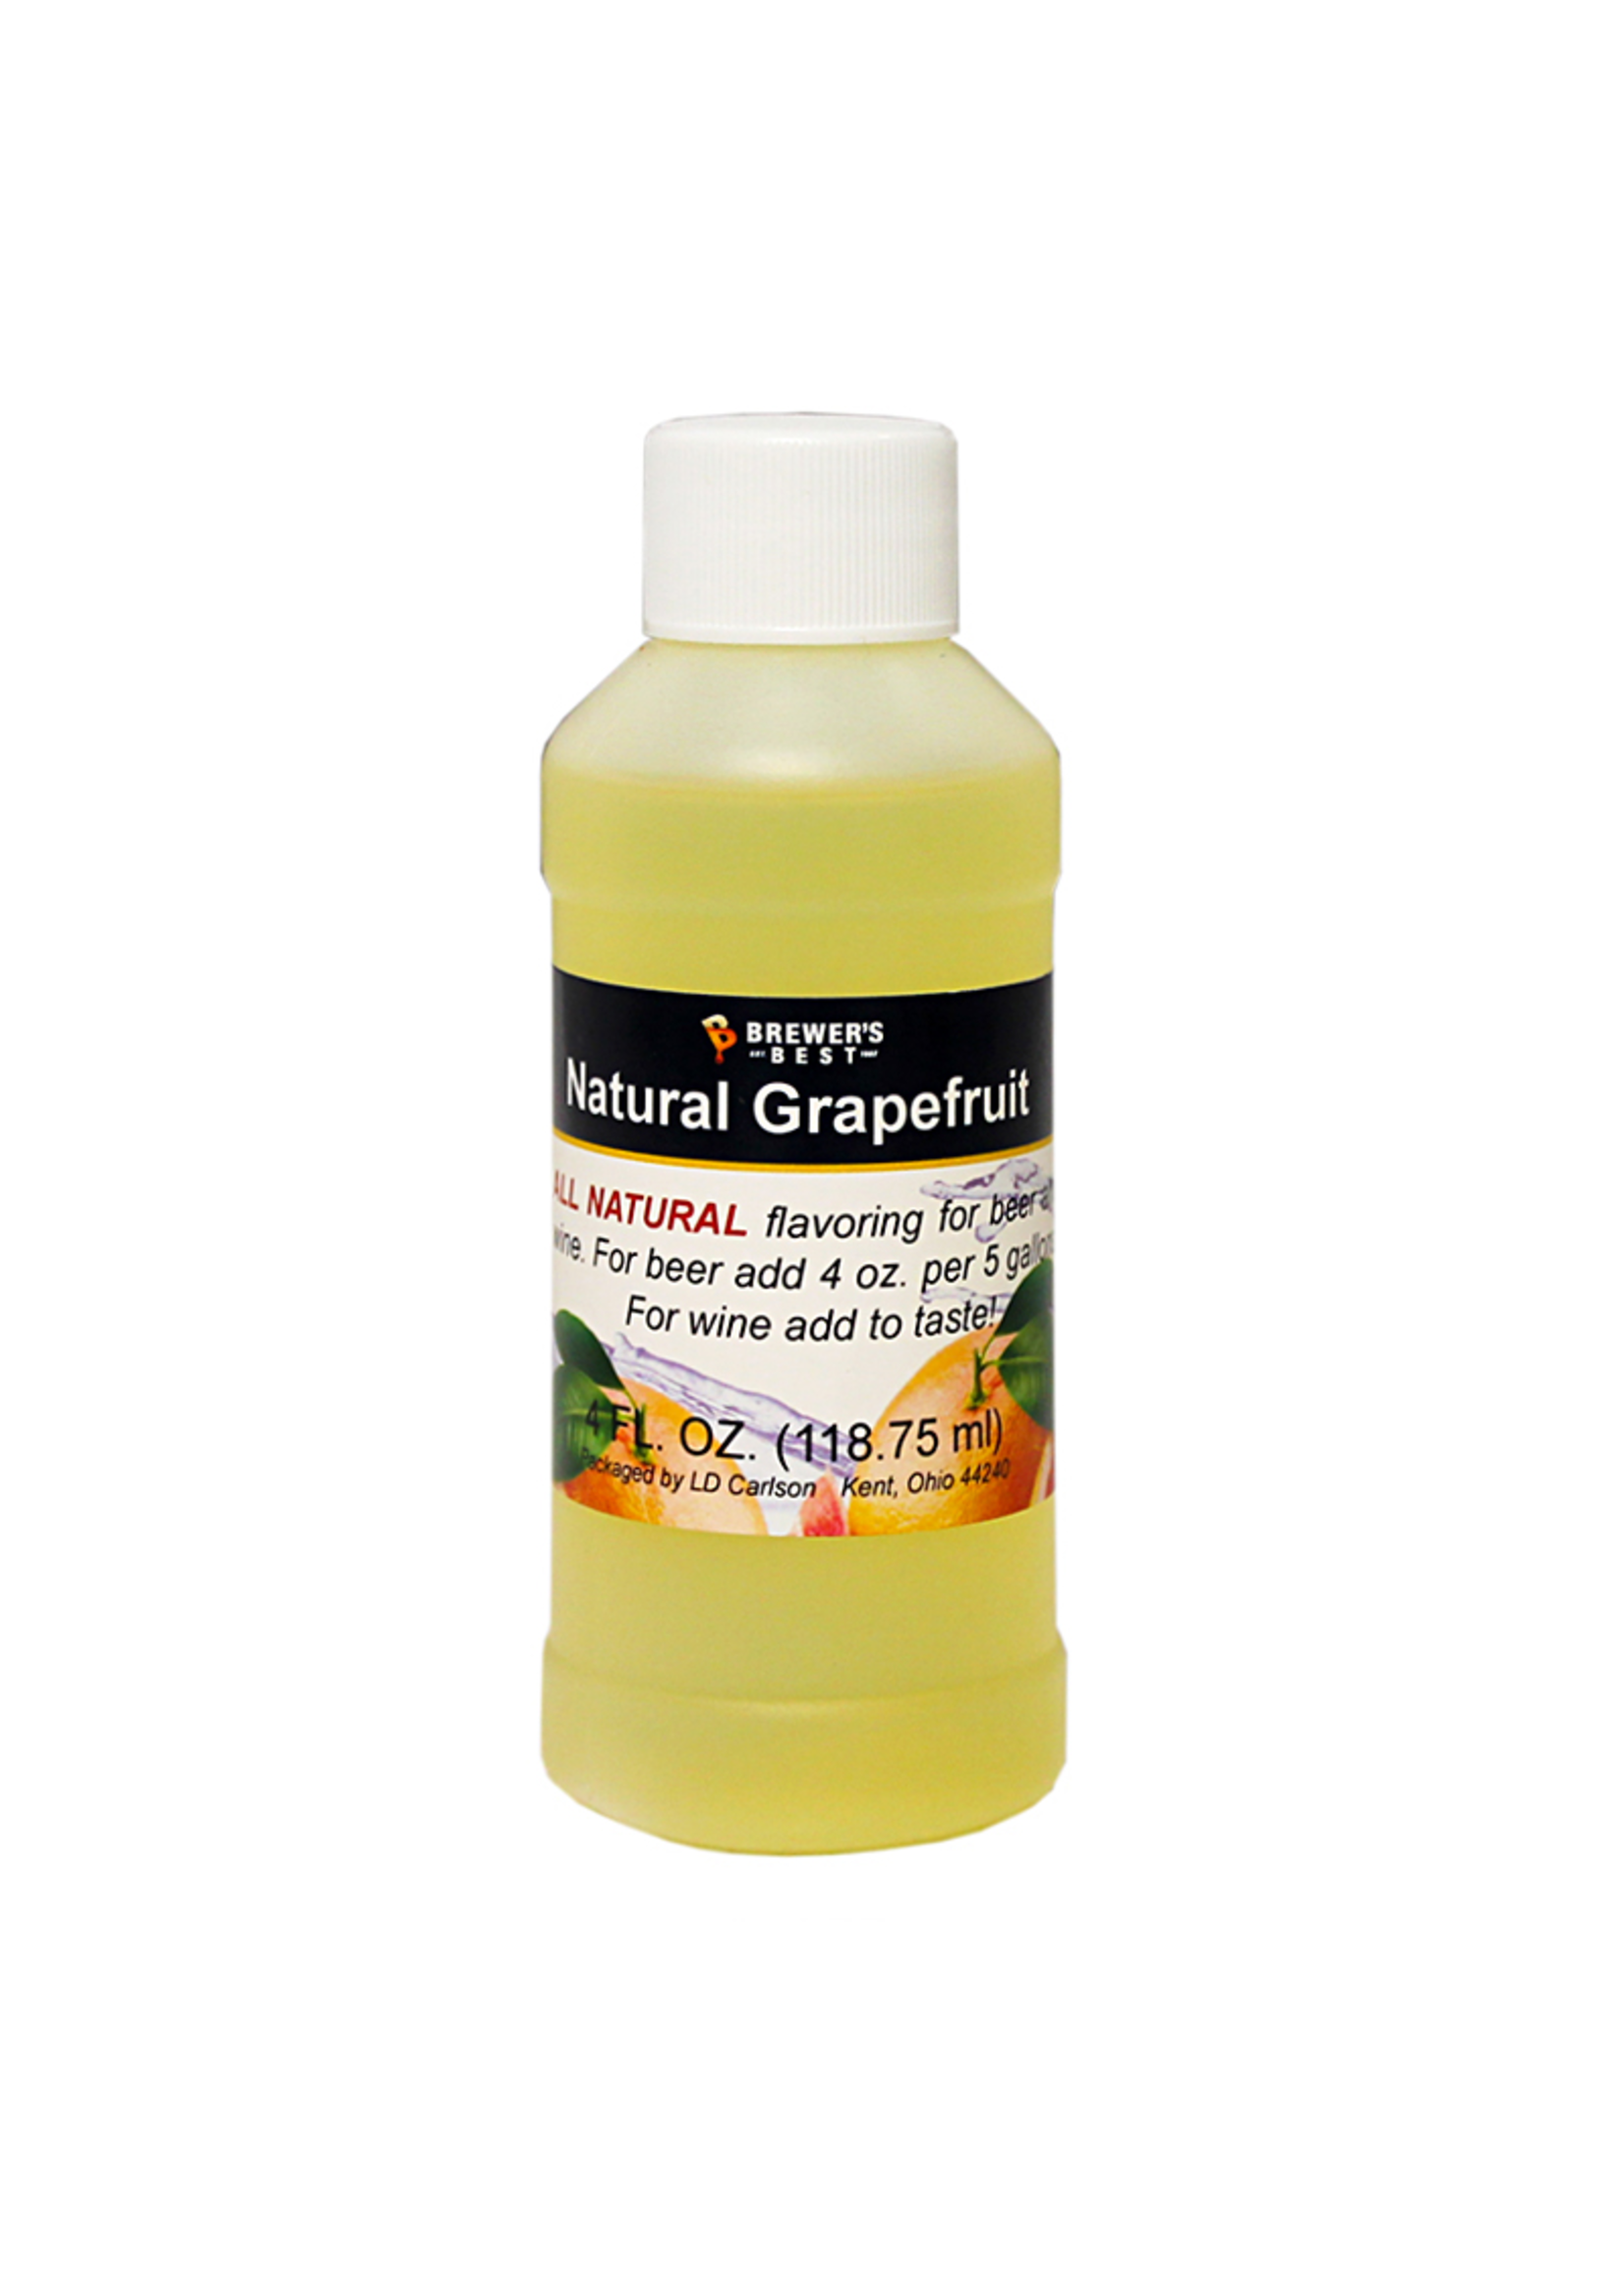 Extracts/Adjuncts Flavoring, Natural - Grapefruit - 4 oz